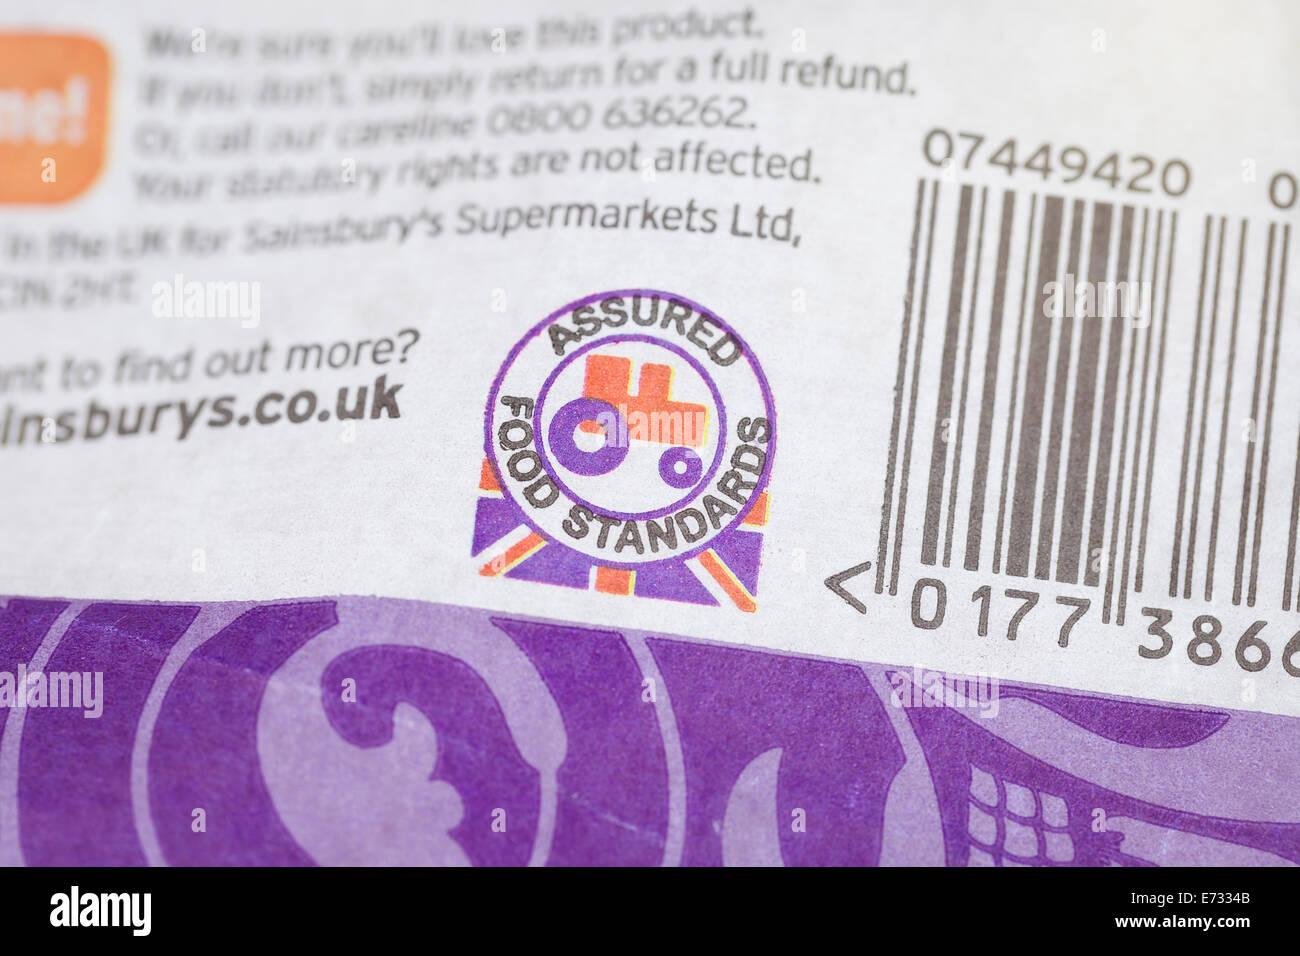 Logo from the assured food standards association, UK - Stock Image